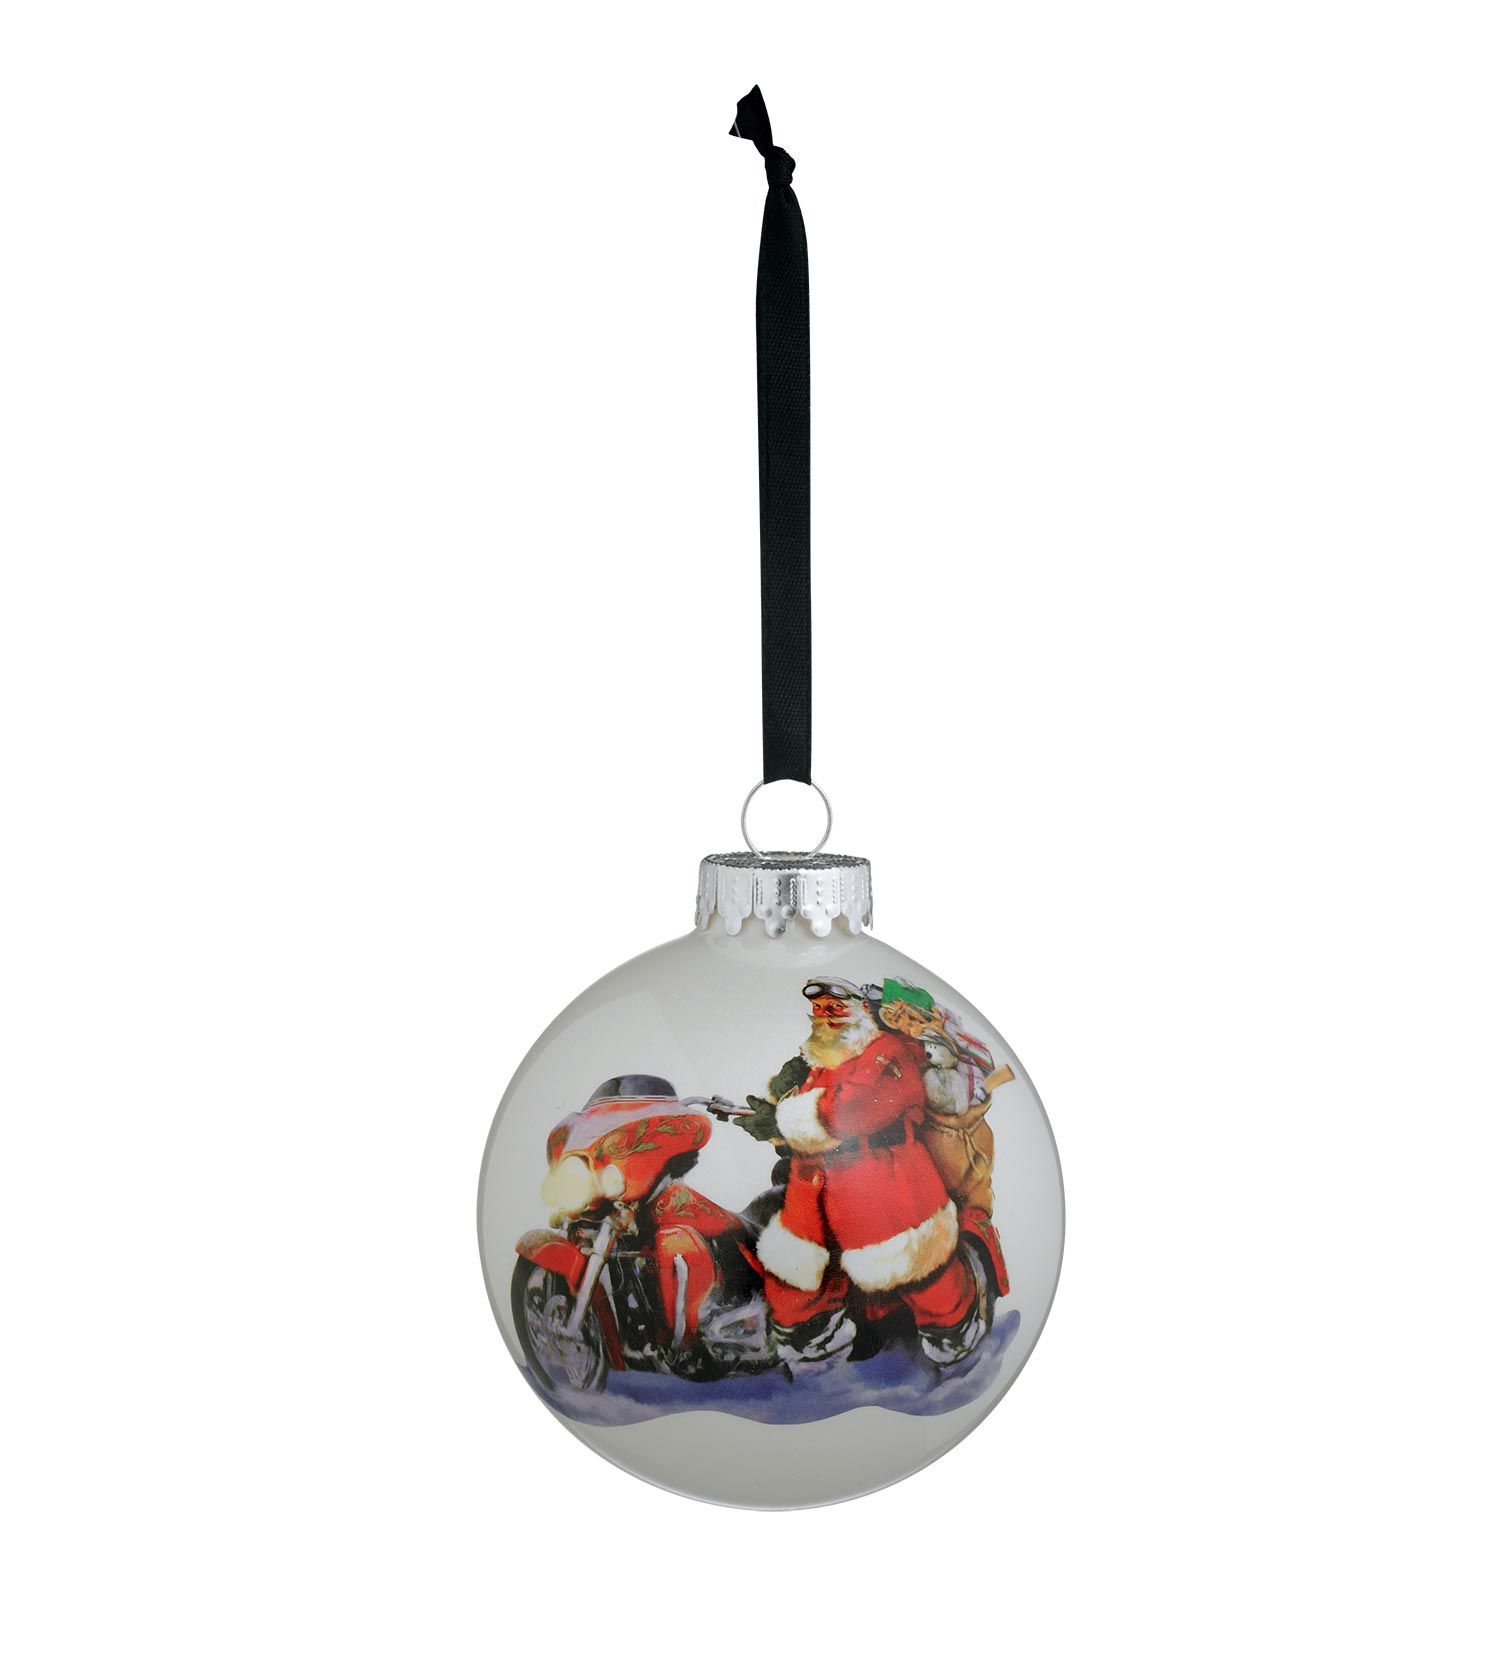 Christmas Tree Shops Union Nj: 96840-17V Harley-Davidson Ornament Ball X-Mas '16 At